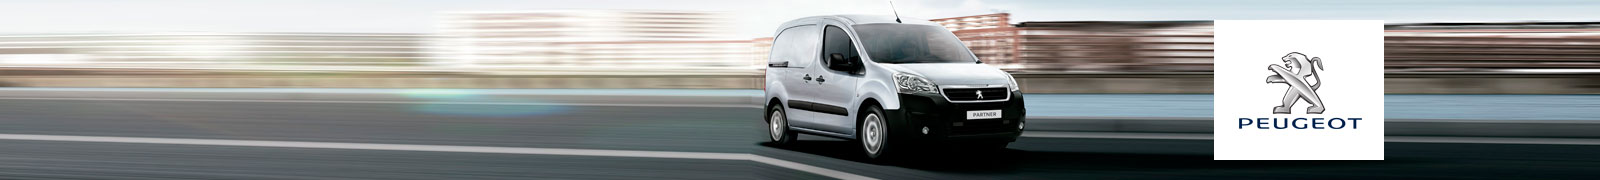 Peugeot Nueva Partner Chile Santiago